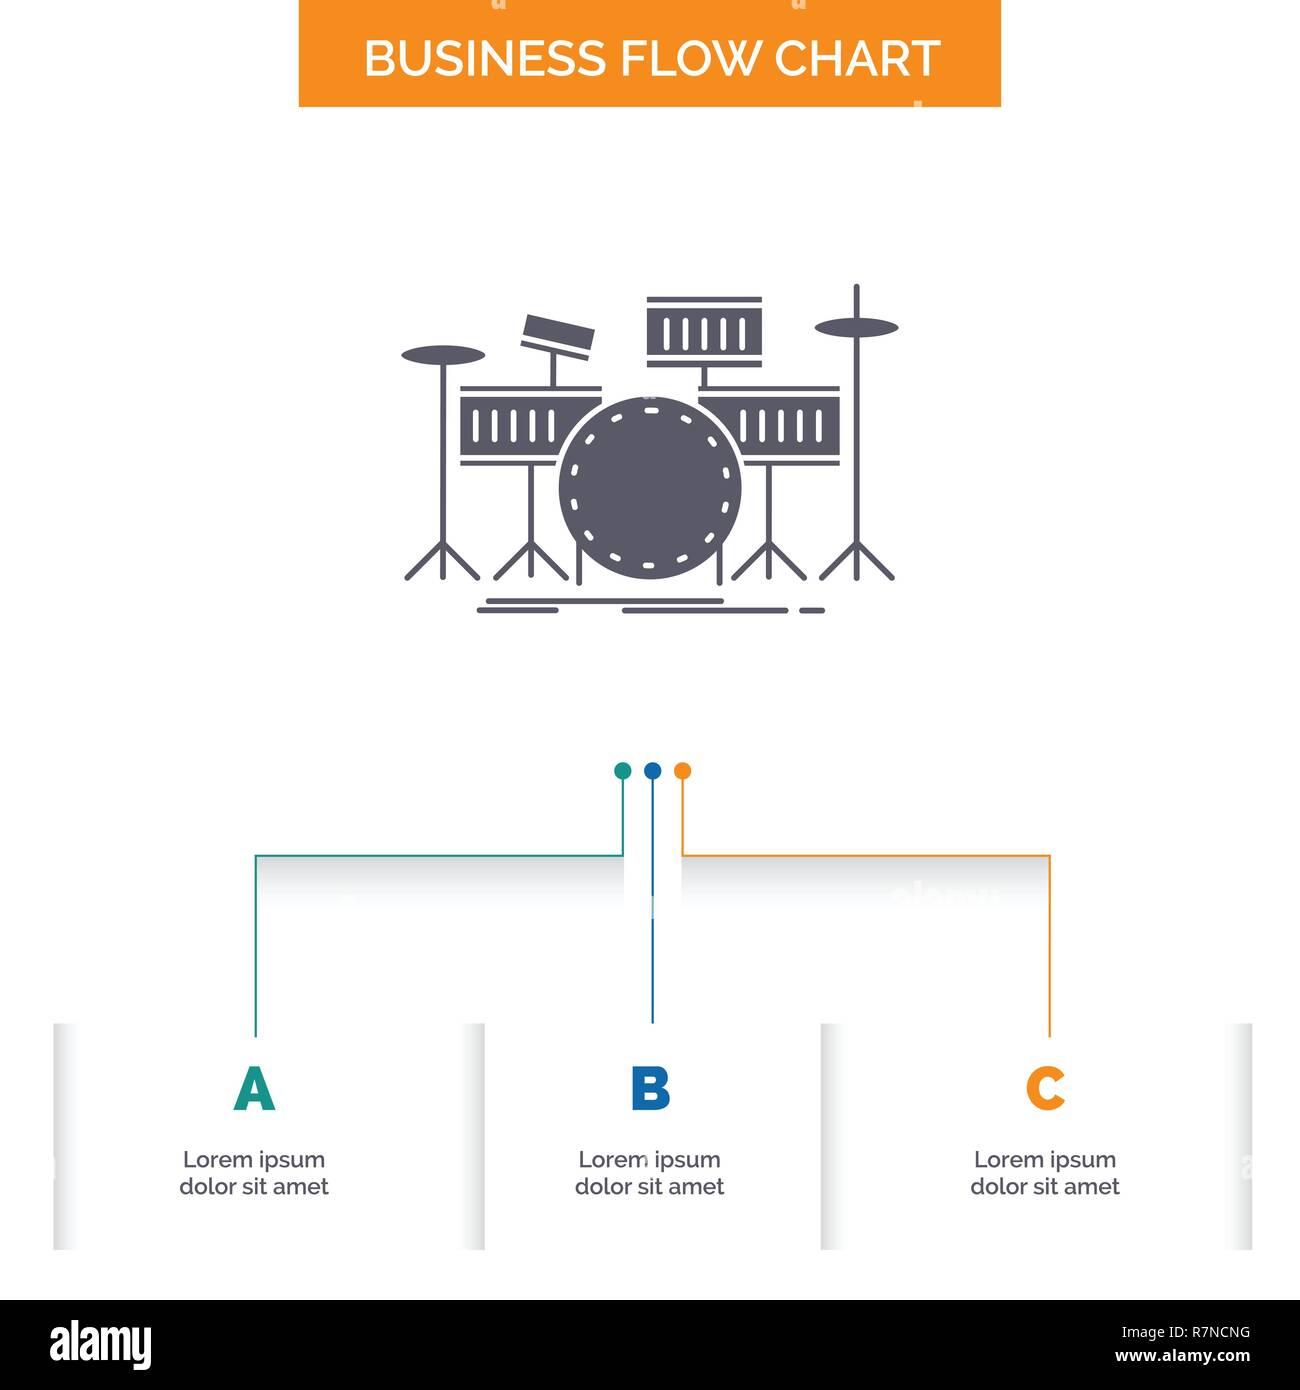 drum, drums, instrument, kit, musical Business Flow Chart Design